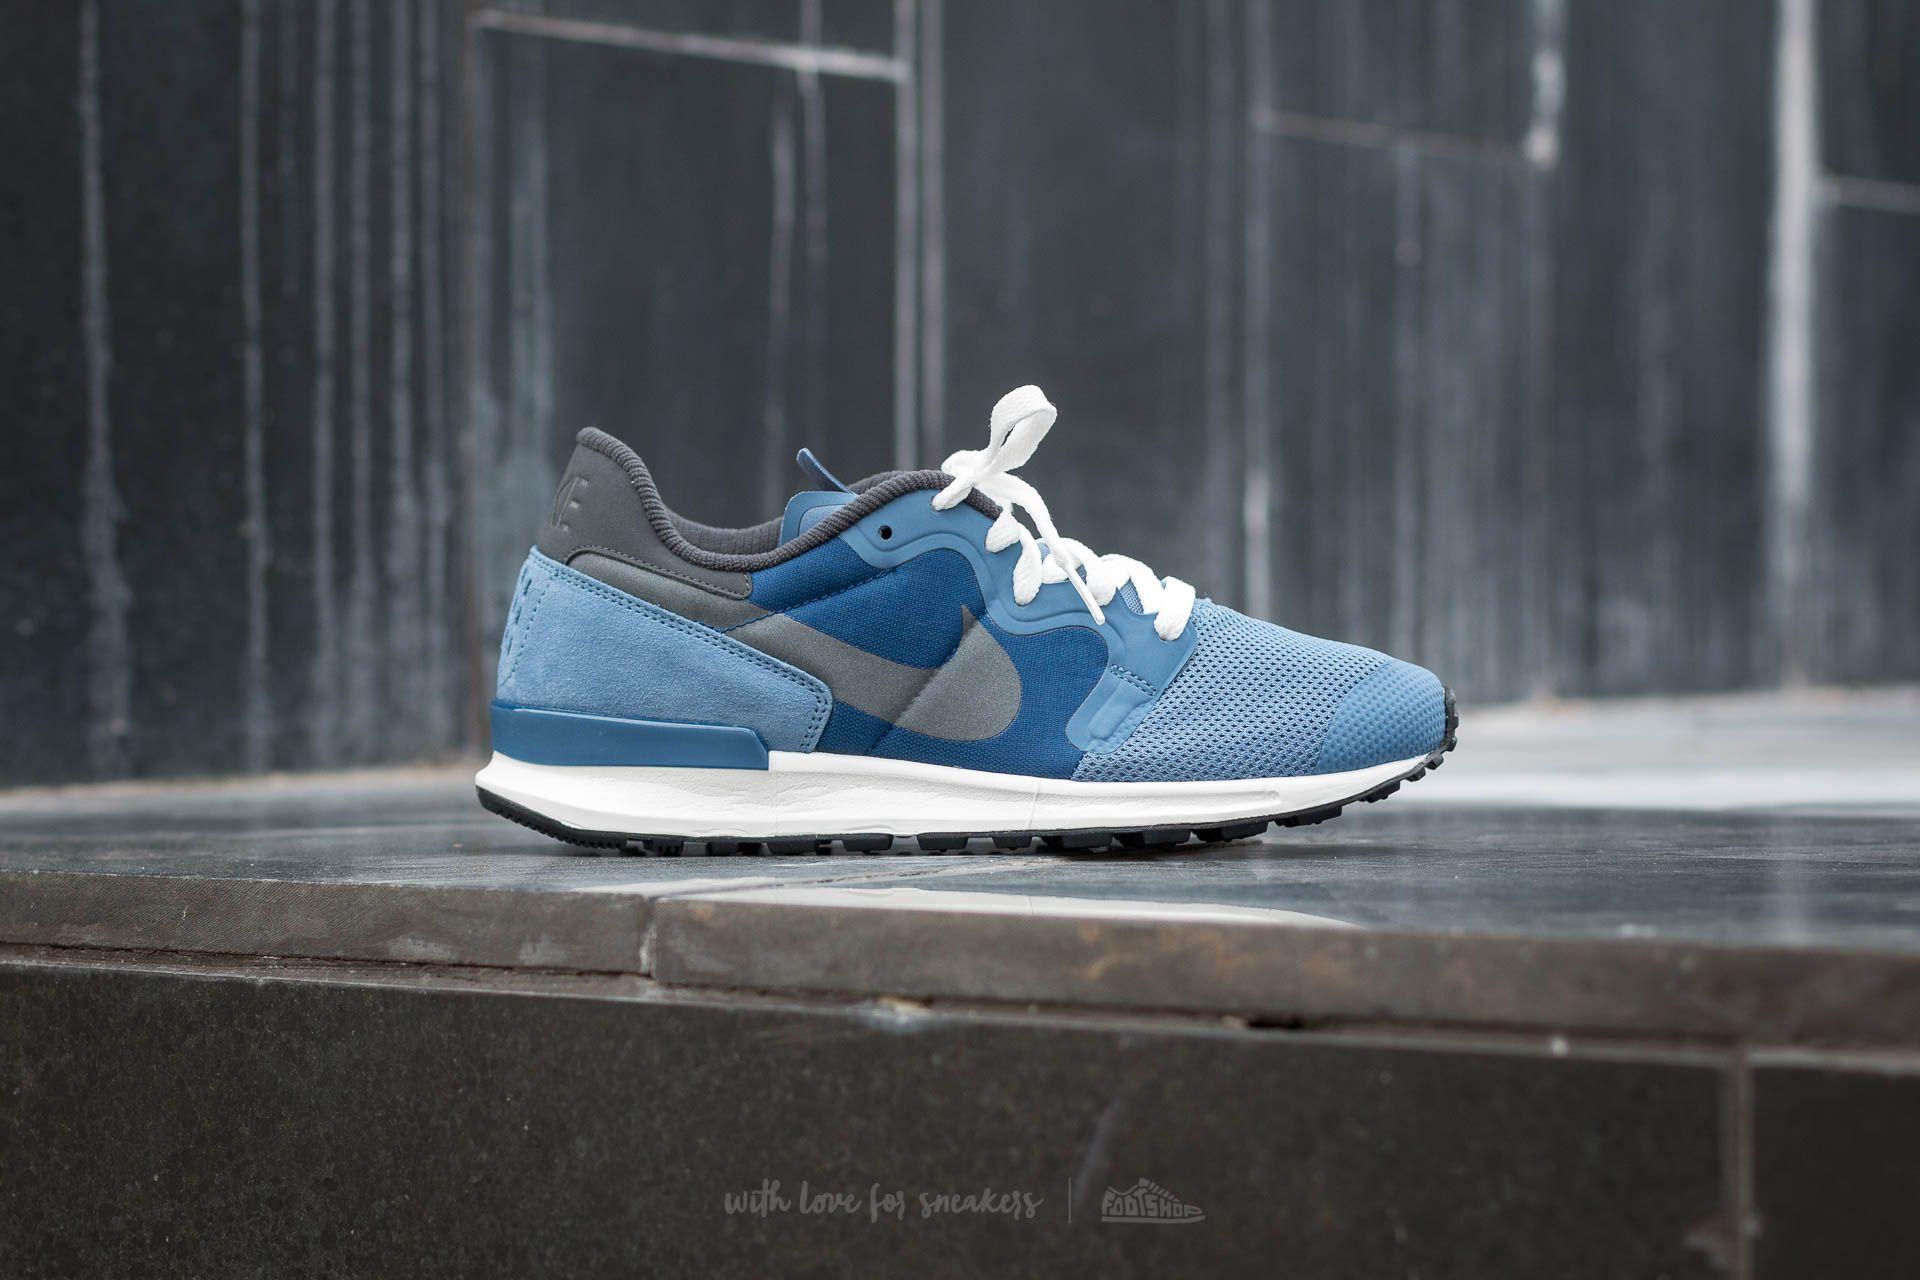 Nike Air Berwuda Ocean Fog Metallic Hematite Coastal Blue